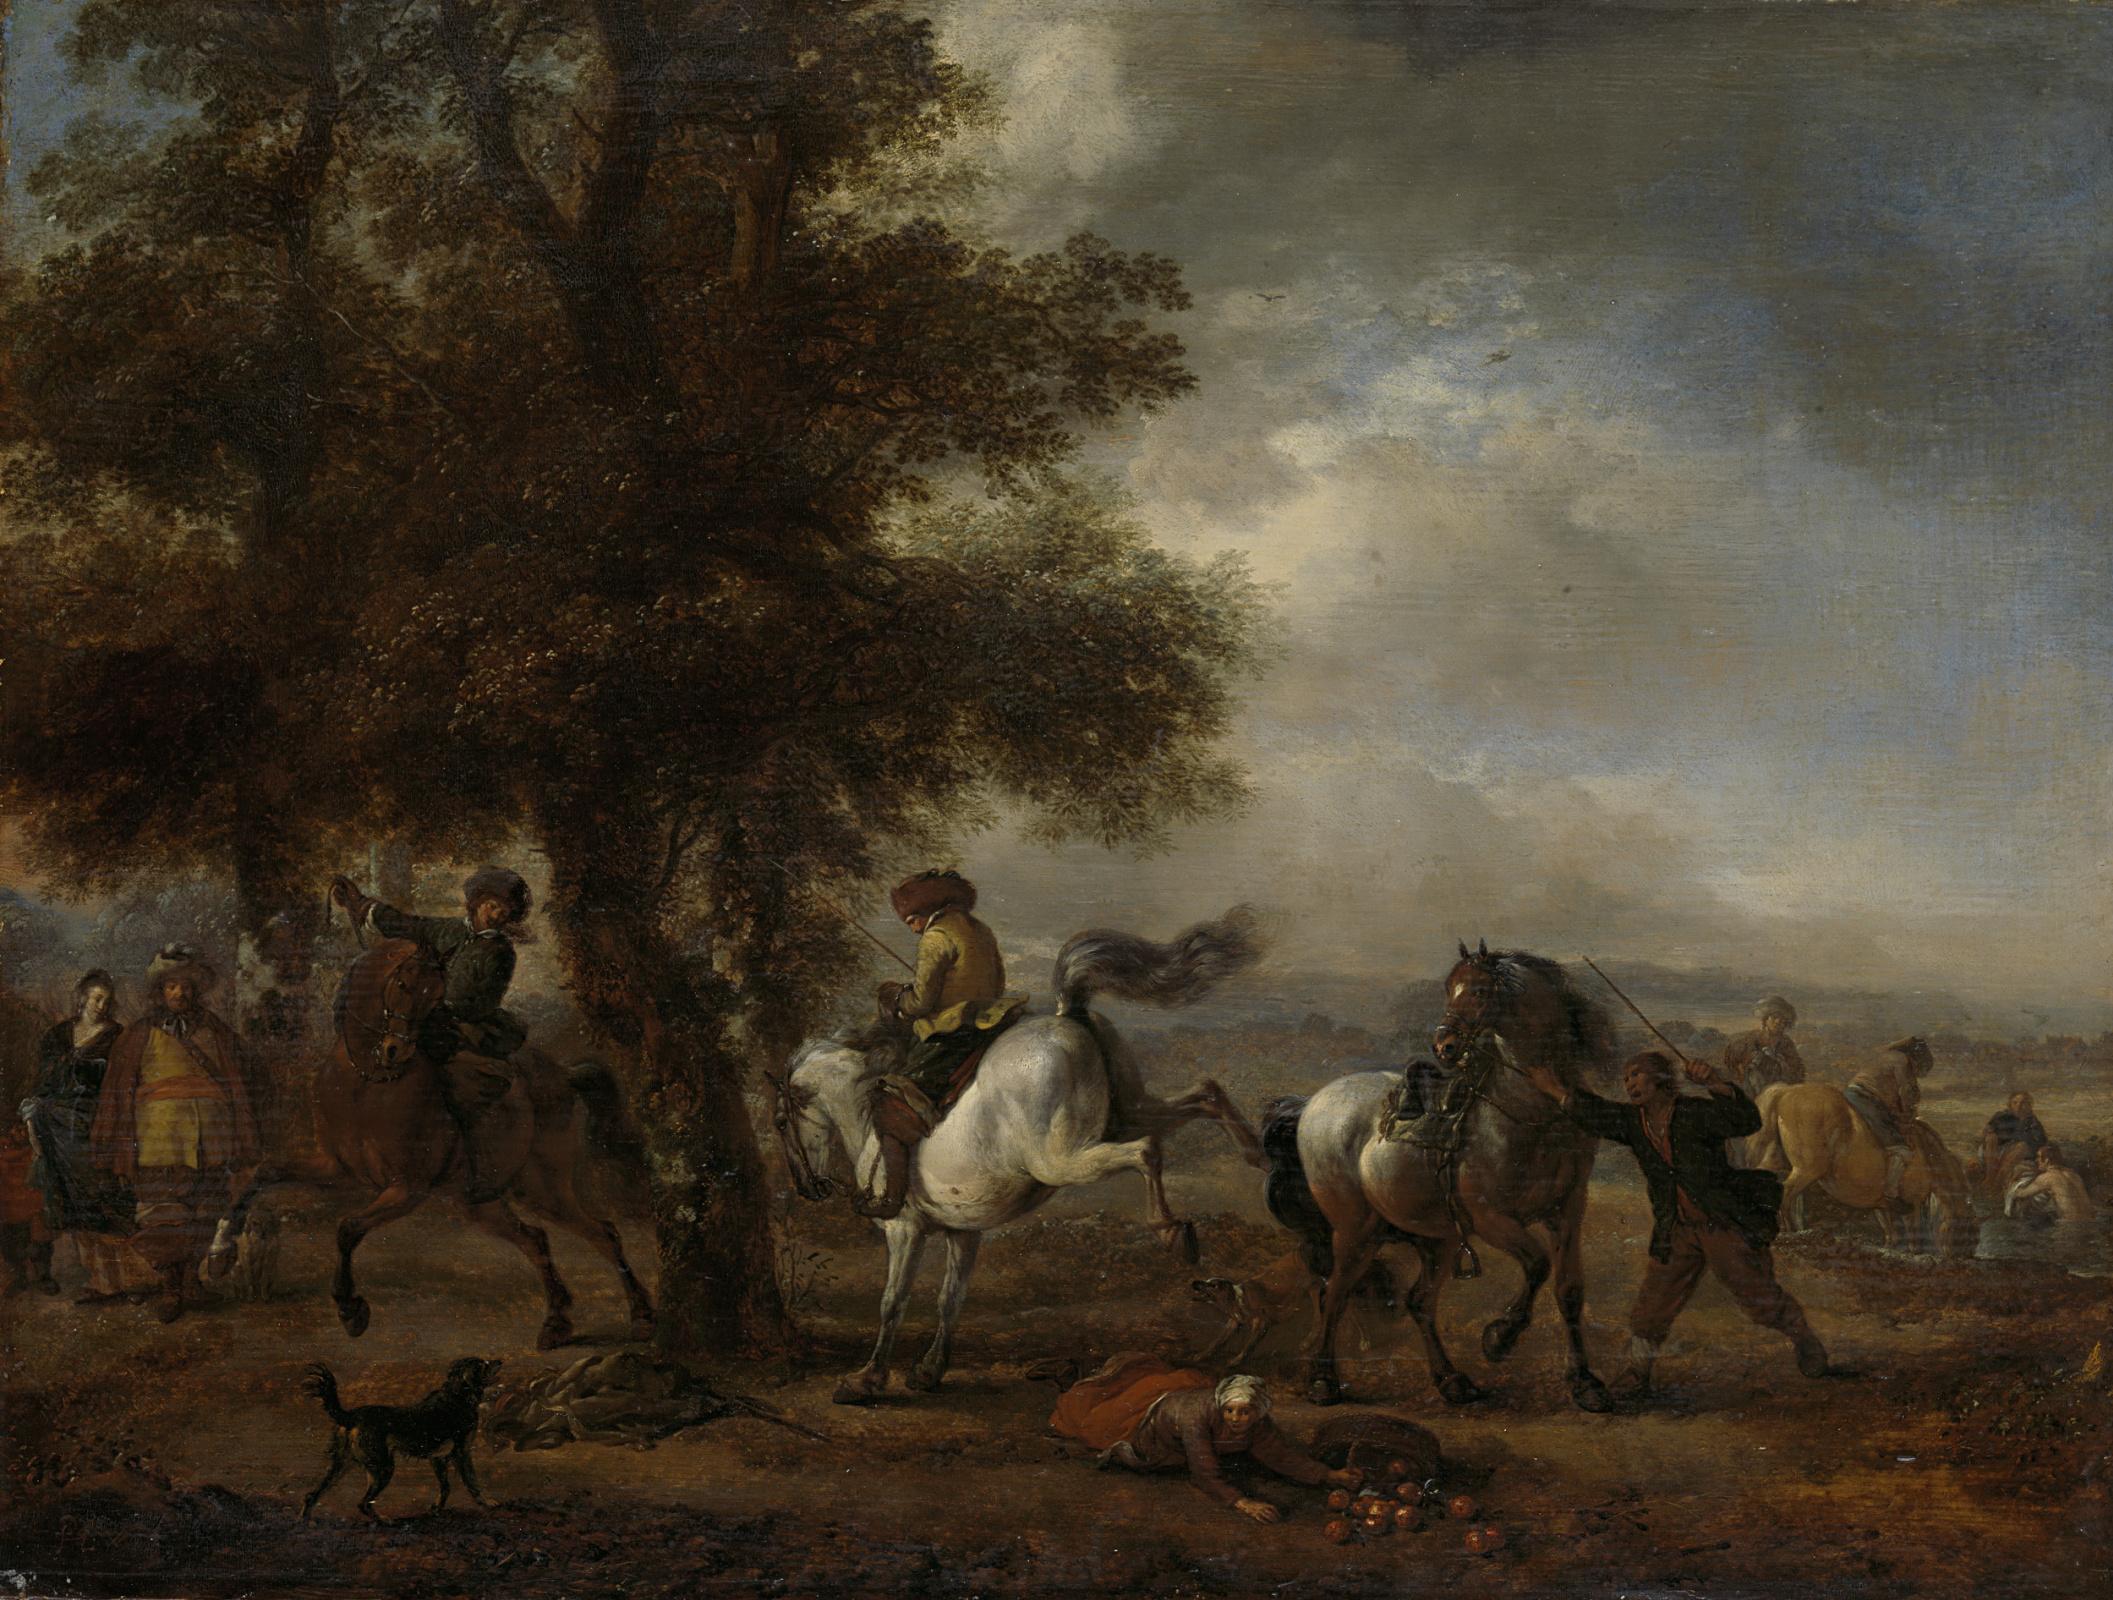 Филипс Вауверман (Воуверман). Удар белой лошади